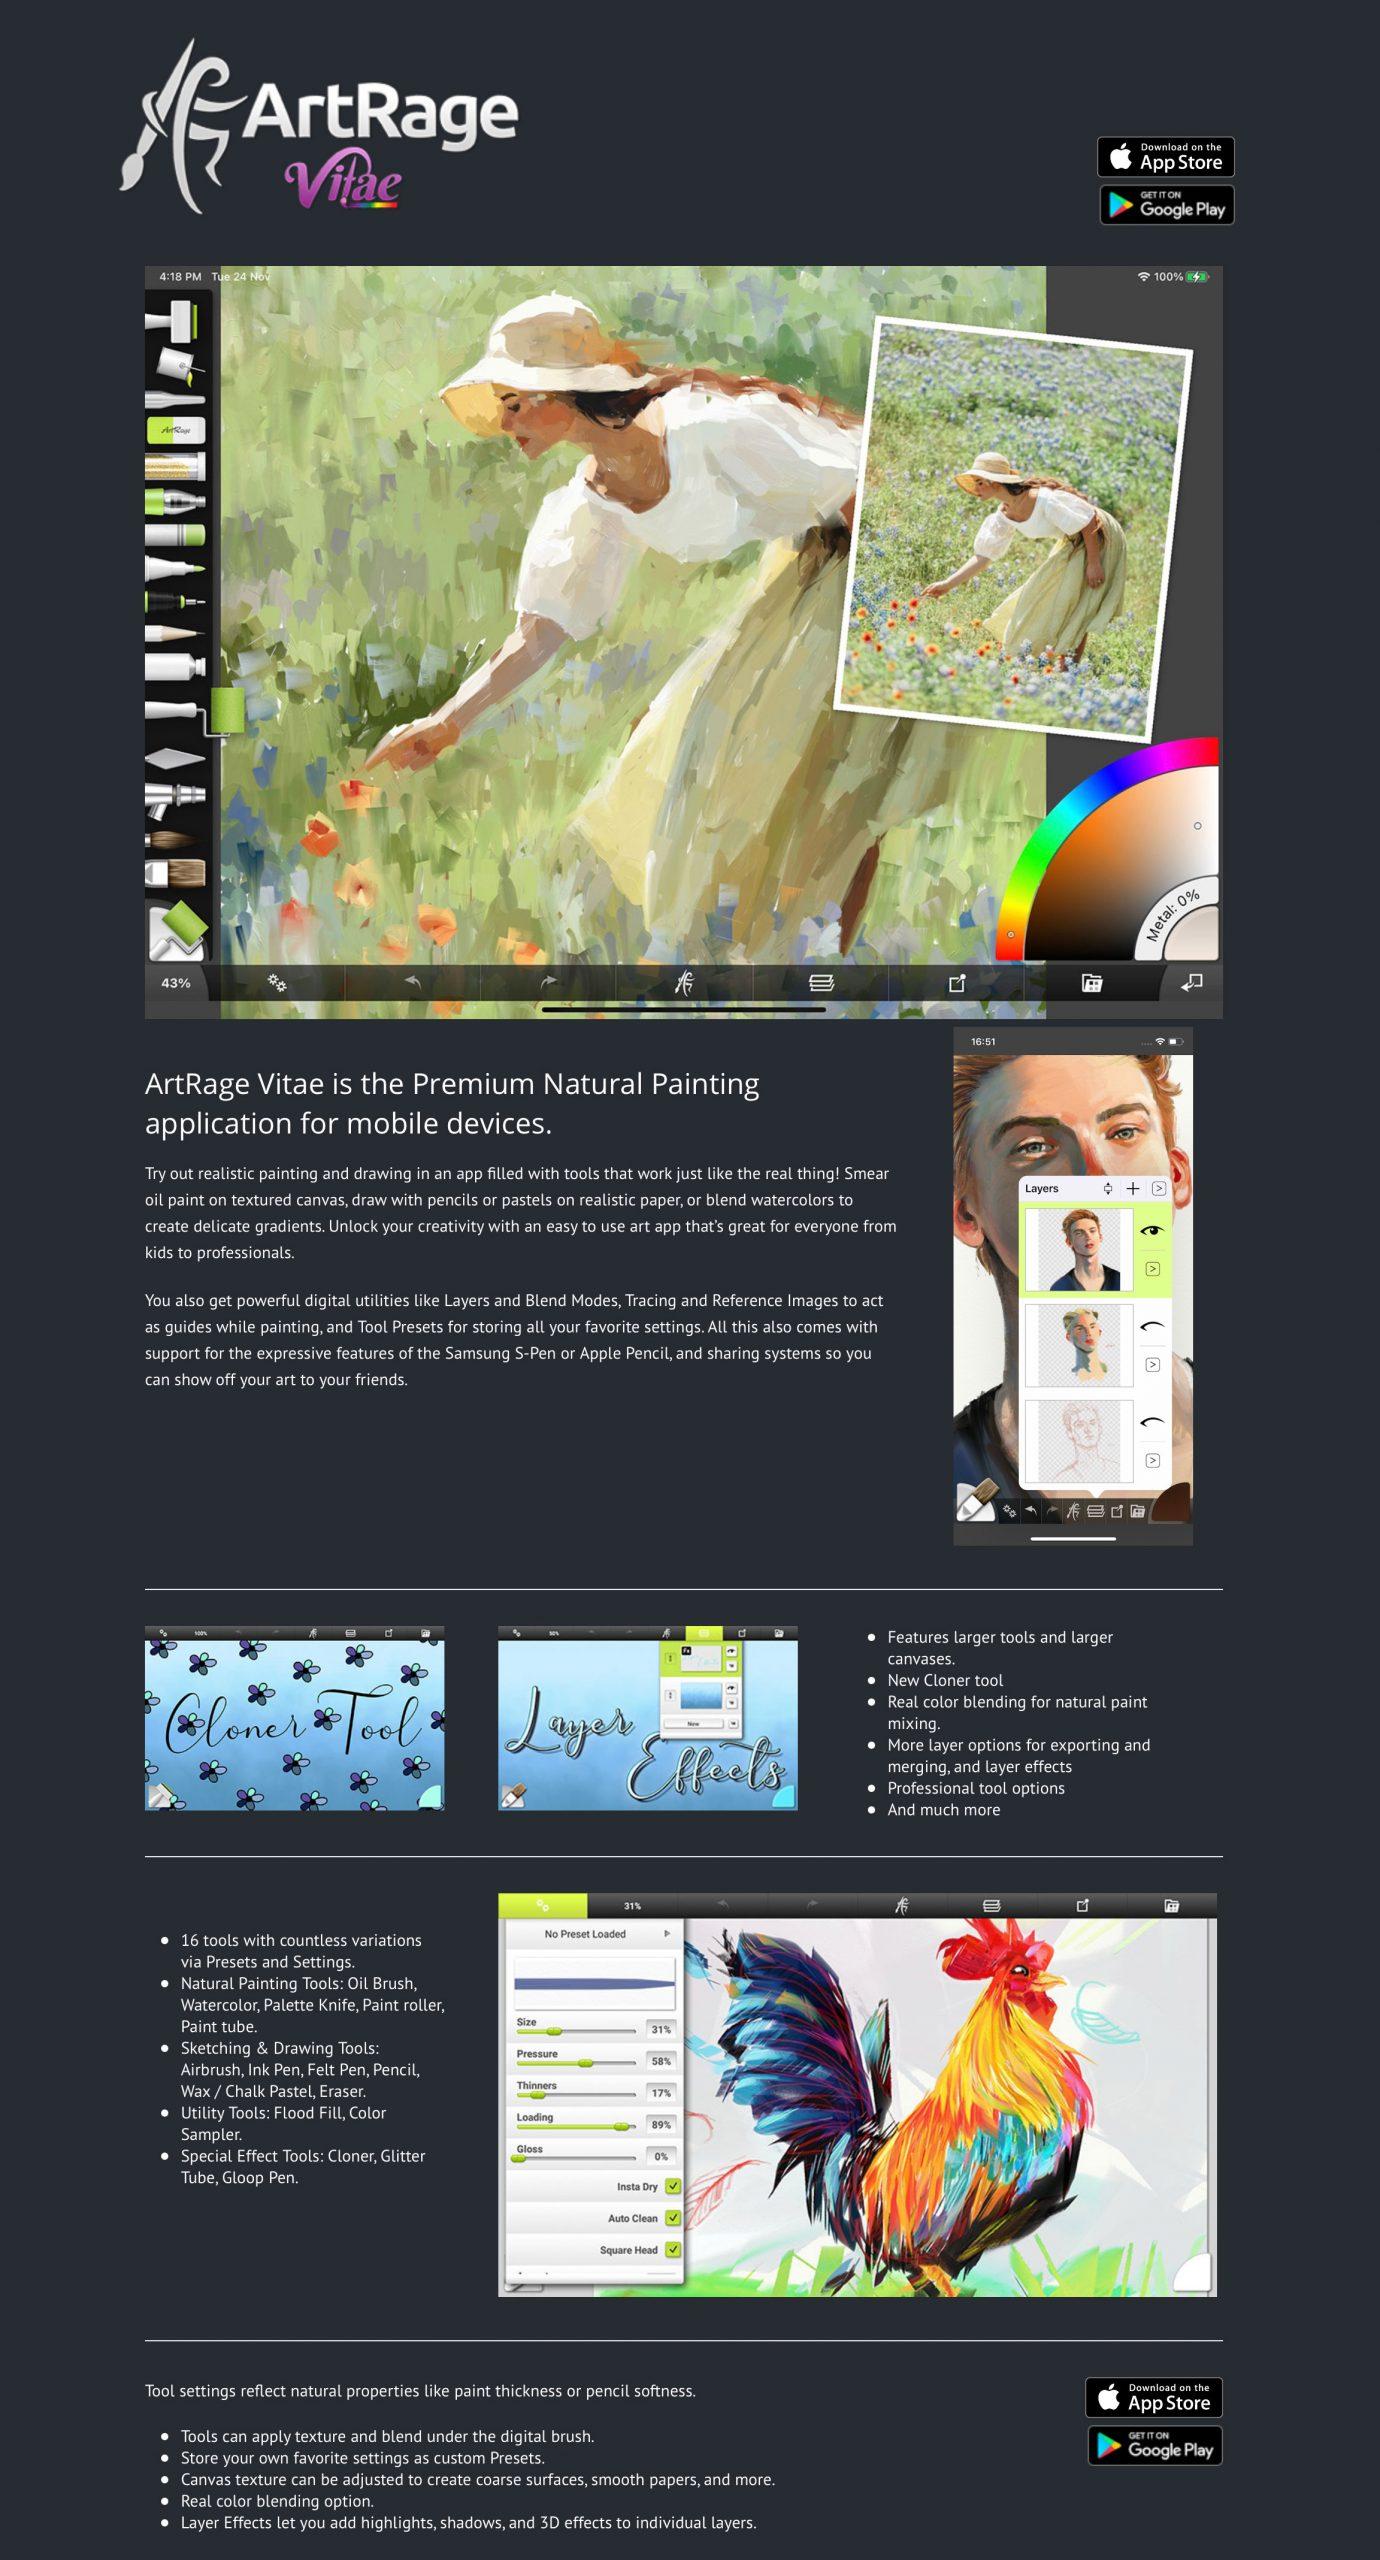 ArtRage Vitae Web Page